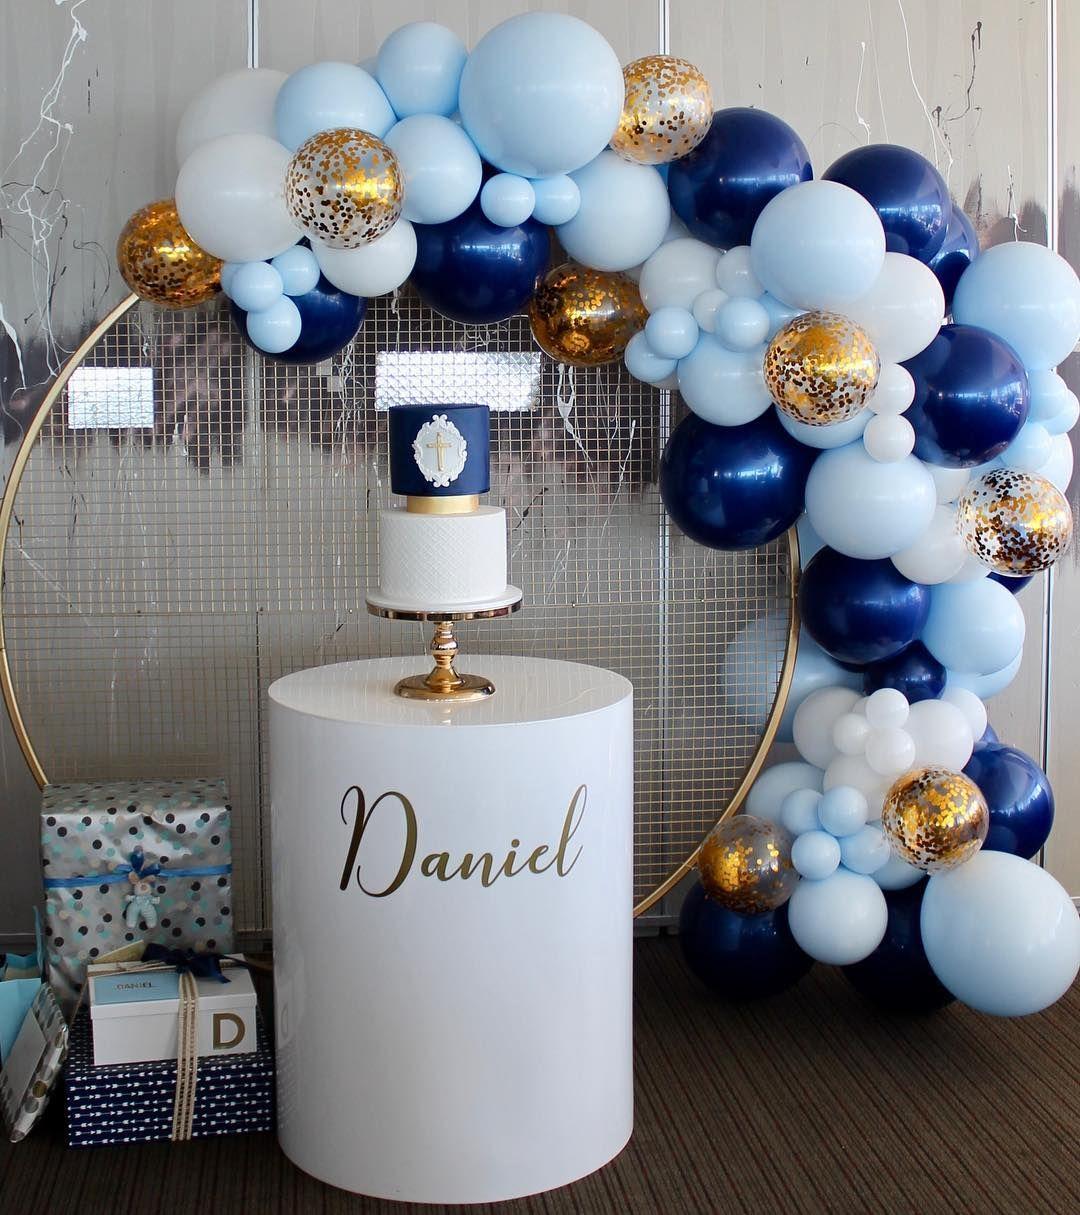 Daniels Christening Wall Plinth @arabellaevents__ Balloons